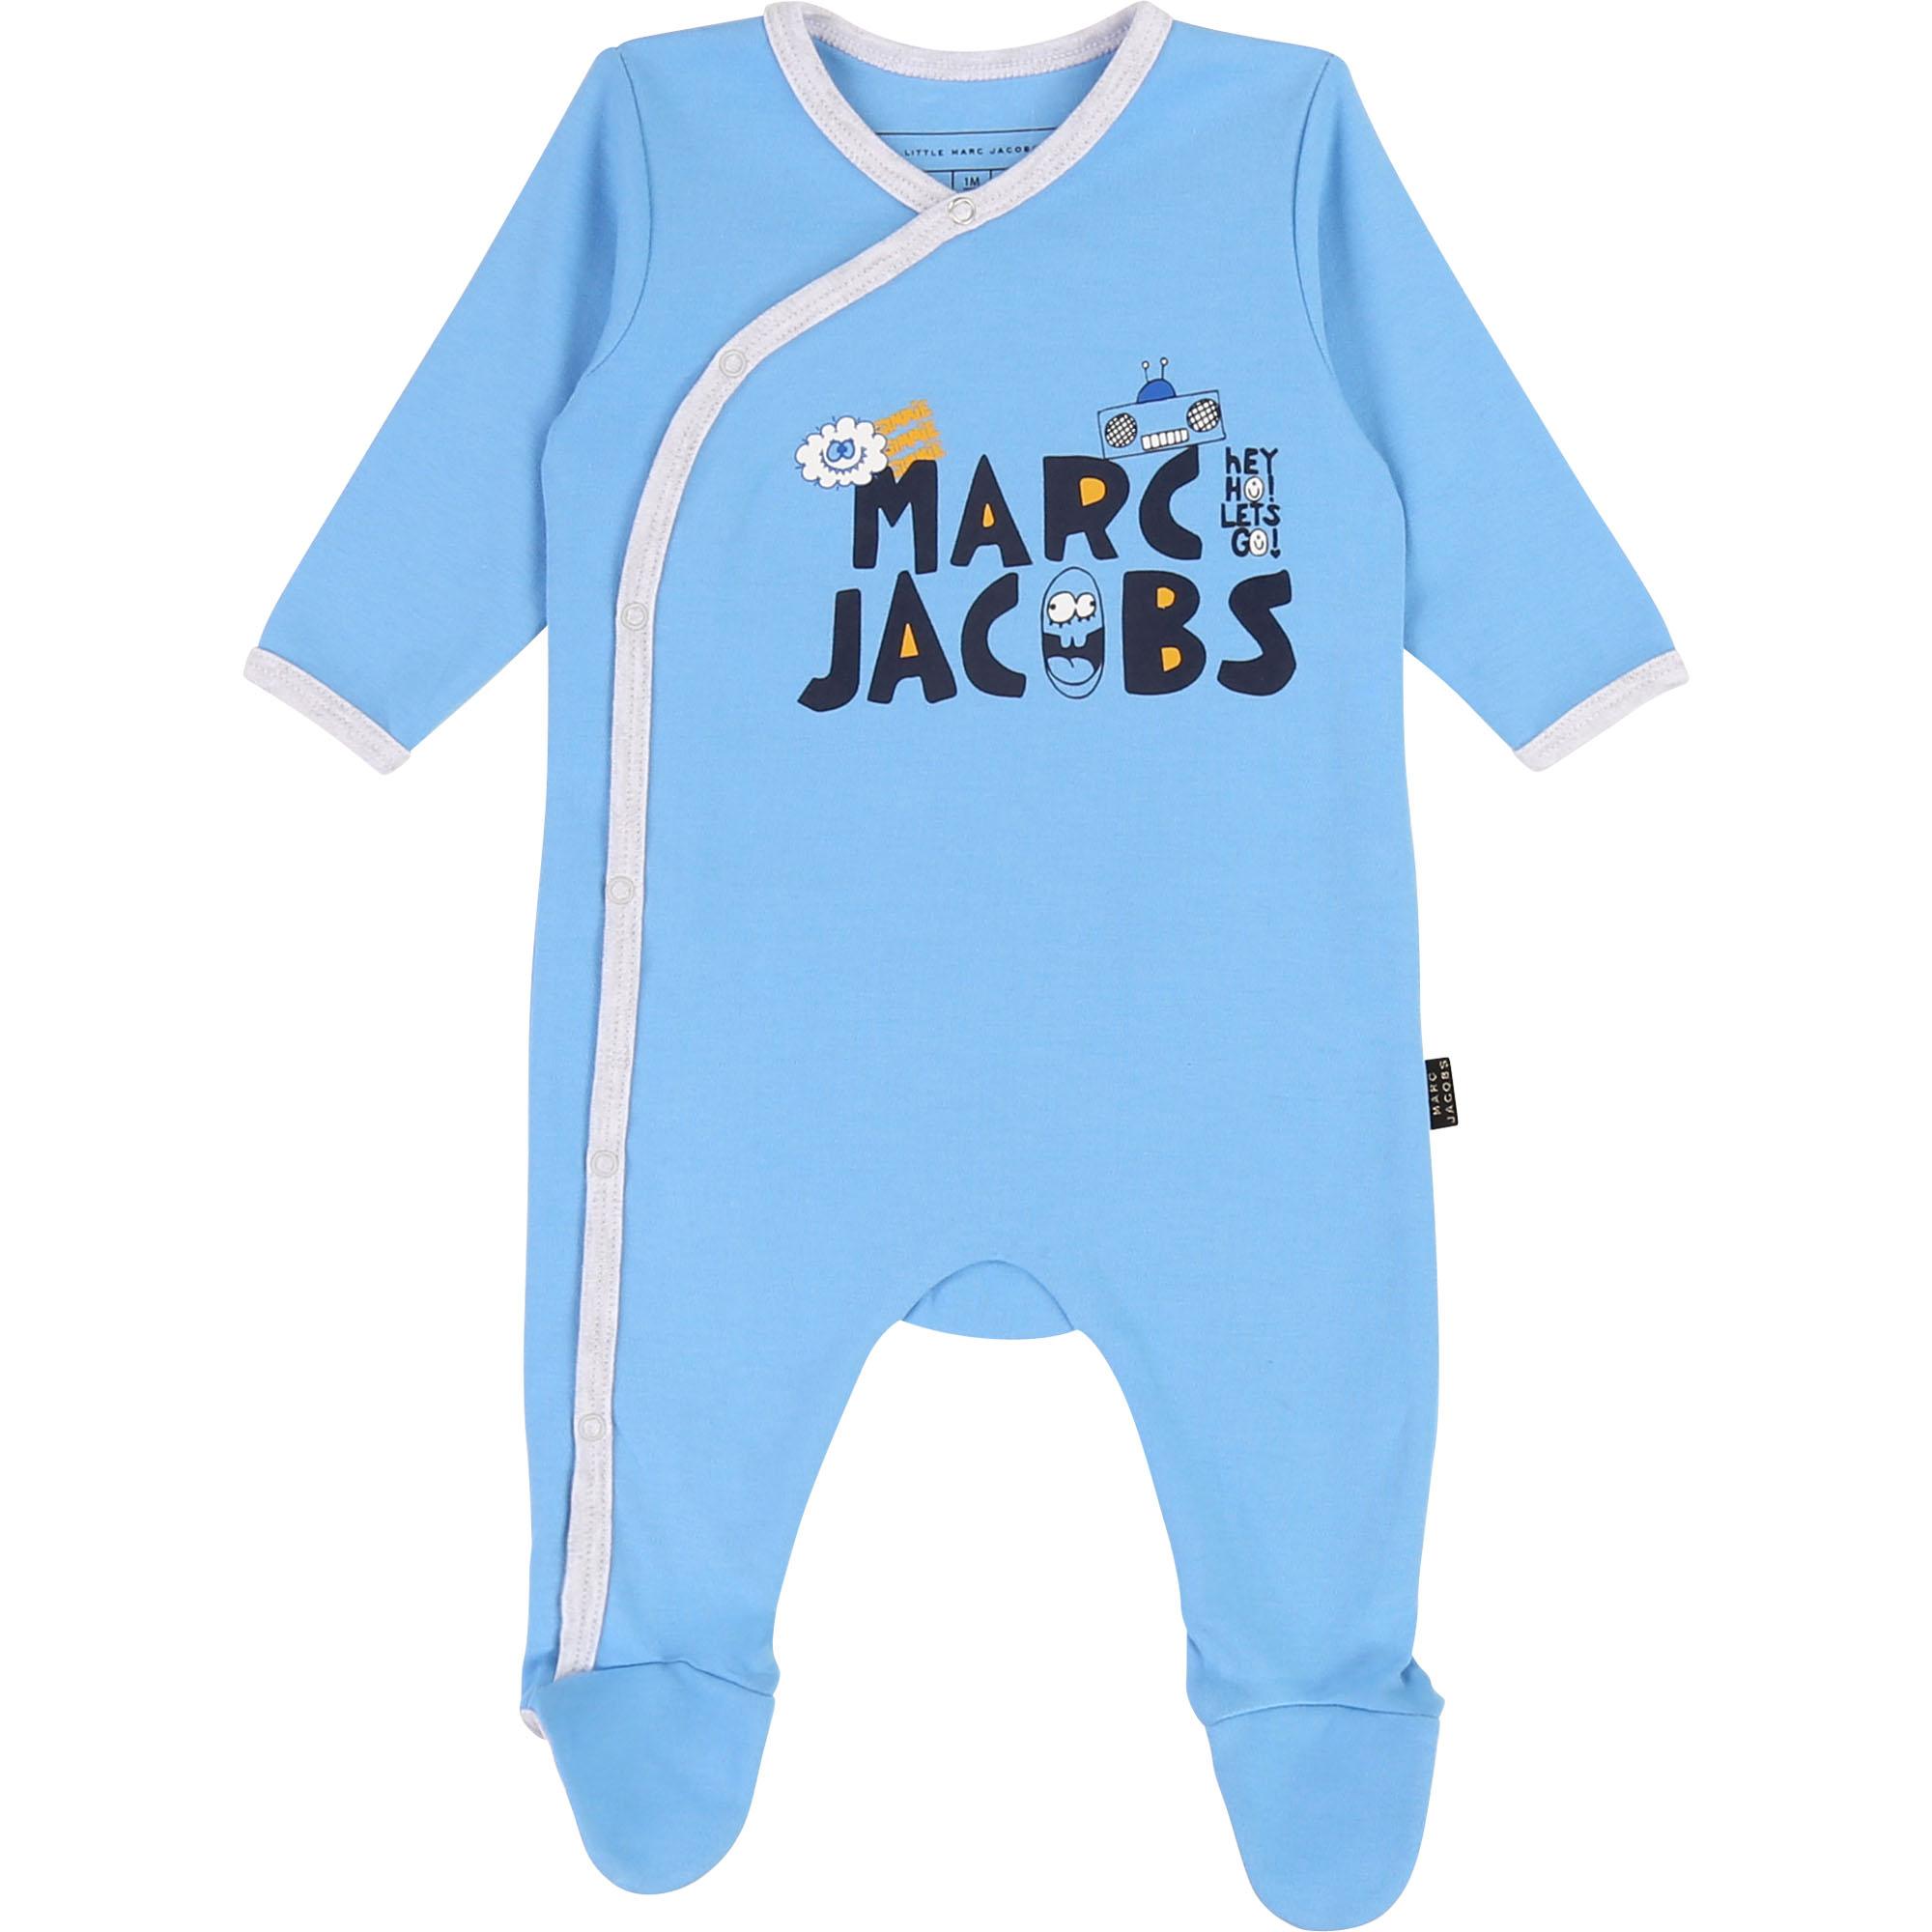 Pyjama en interlock fantaisie THE MARC JACOBS BEBE COUCHE UNISEXE Bleu